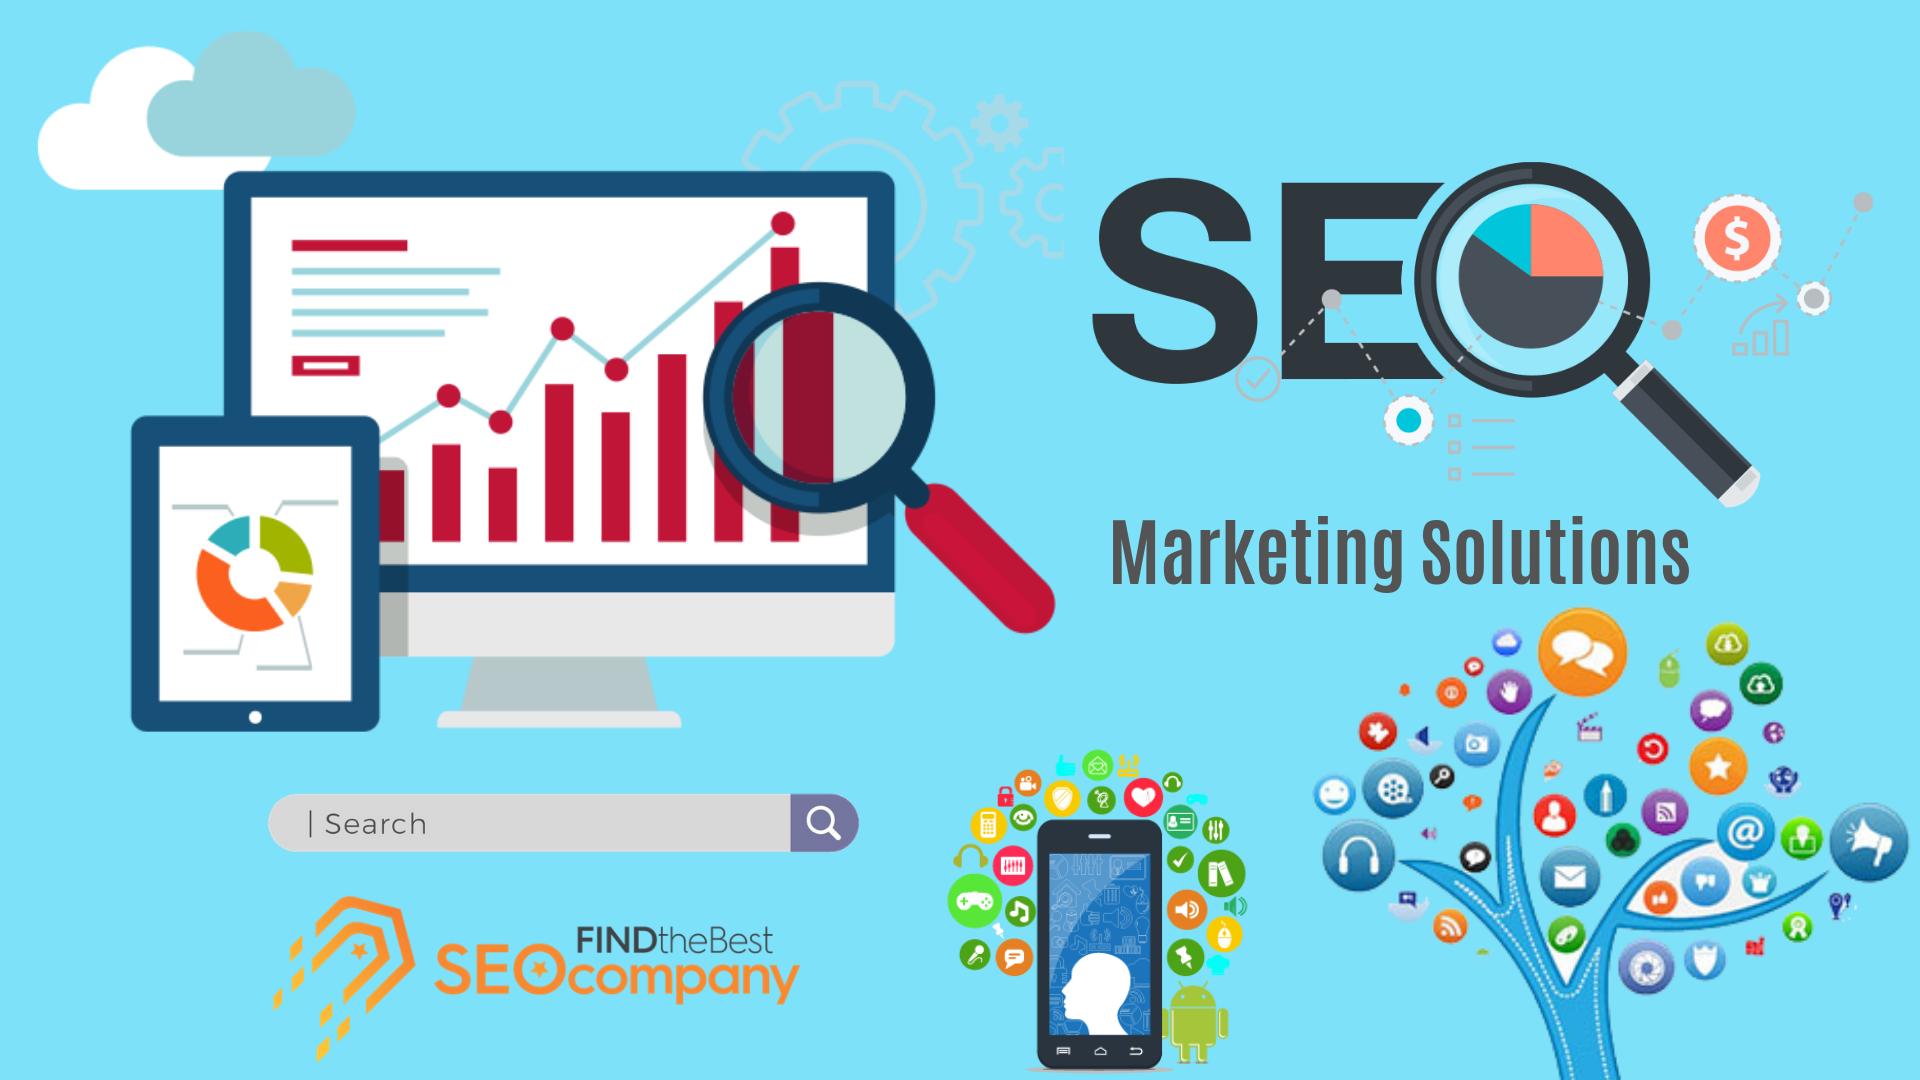 Trusted Seo Service Provider Digital Marketing Solutions Marketing Solution Seo Services